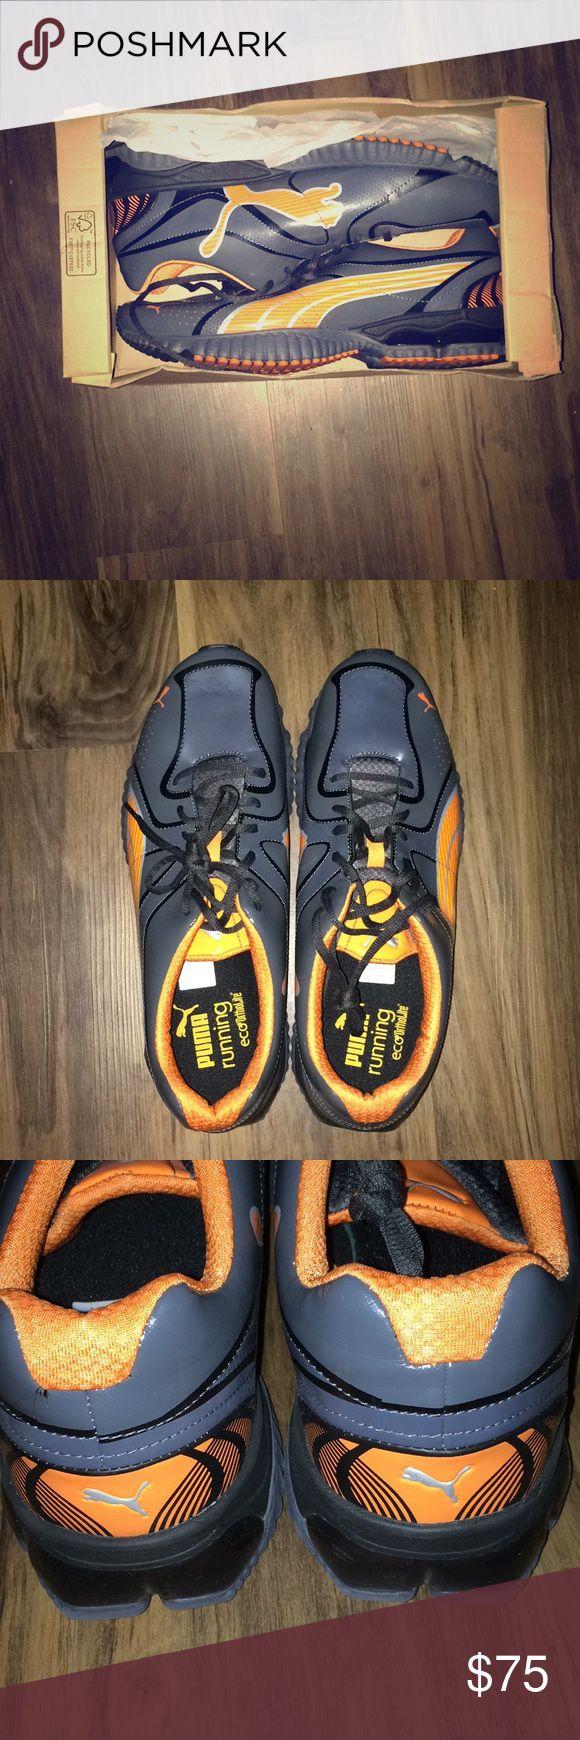 NIB PUMA men's new running shoes. NEW IN BOX! PUMA men's running shoes. Puma Shoes Sneakers